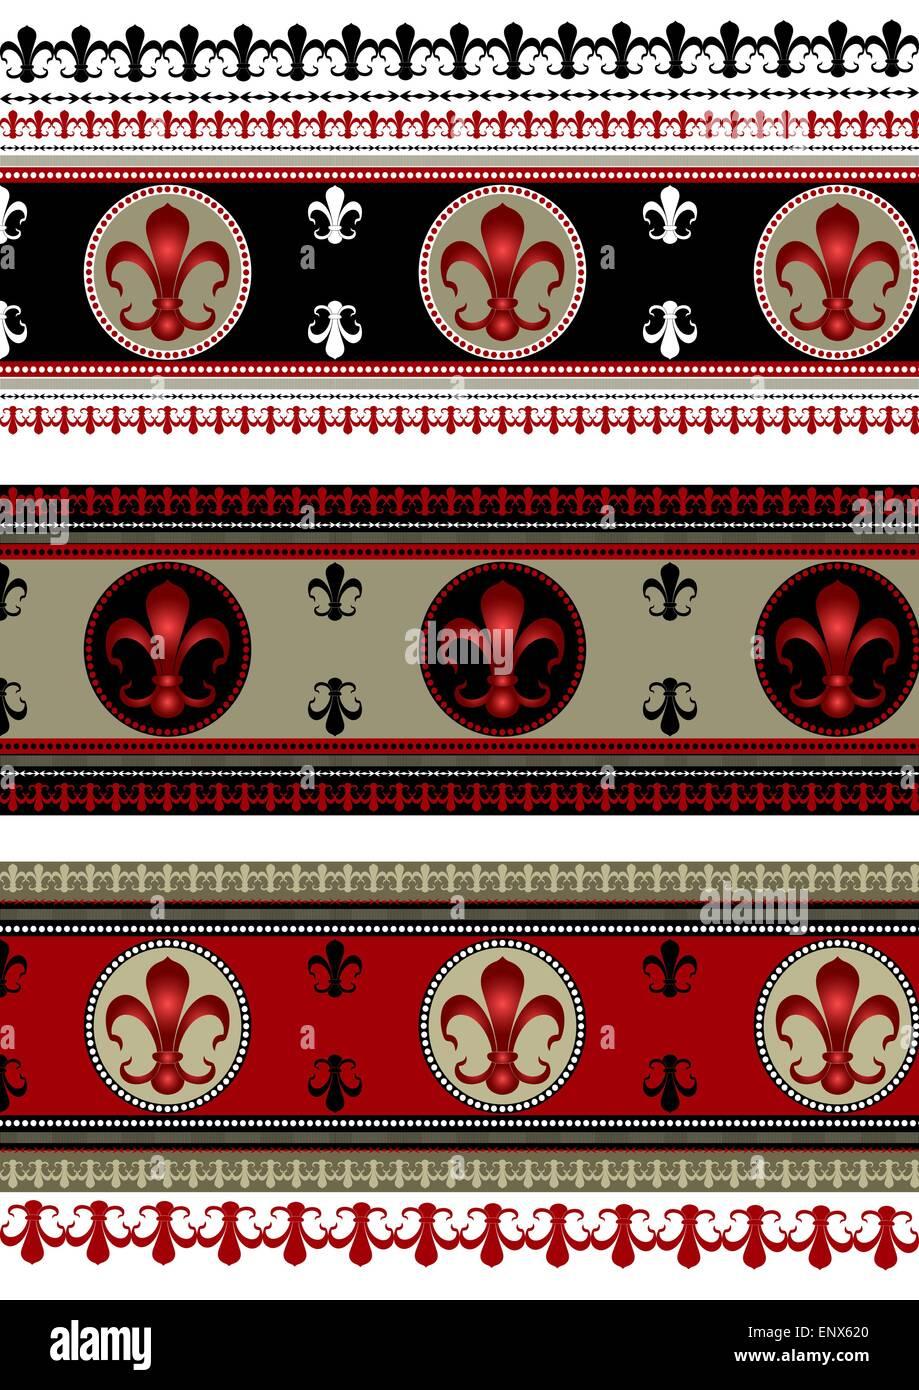 Set Of Backgrounds With Heraldic Symbols Stock Vector Art